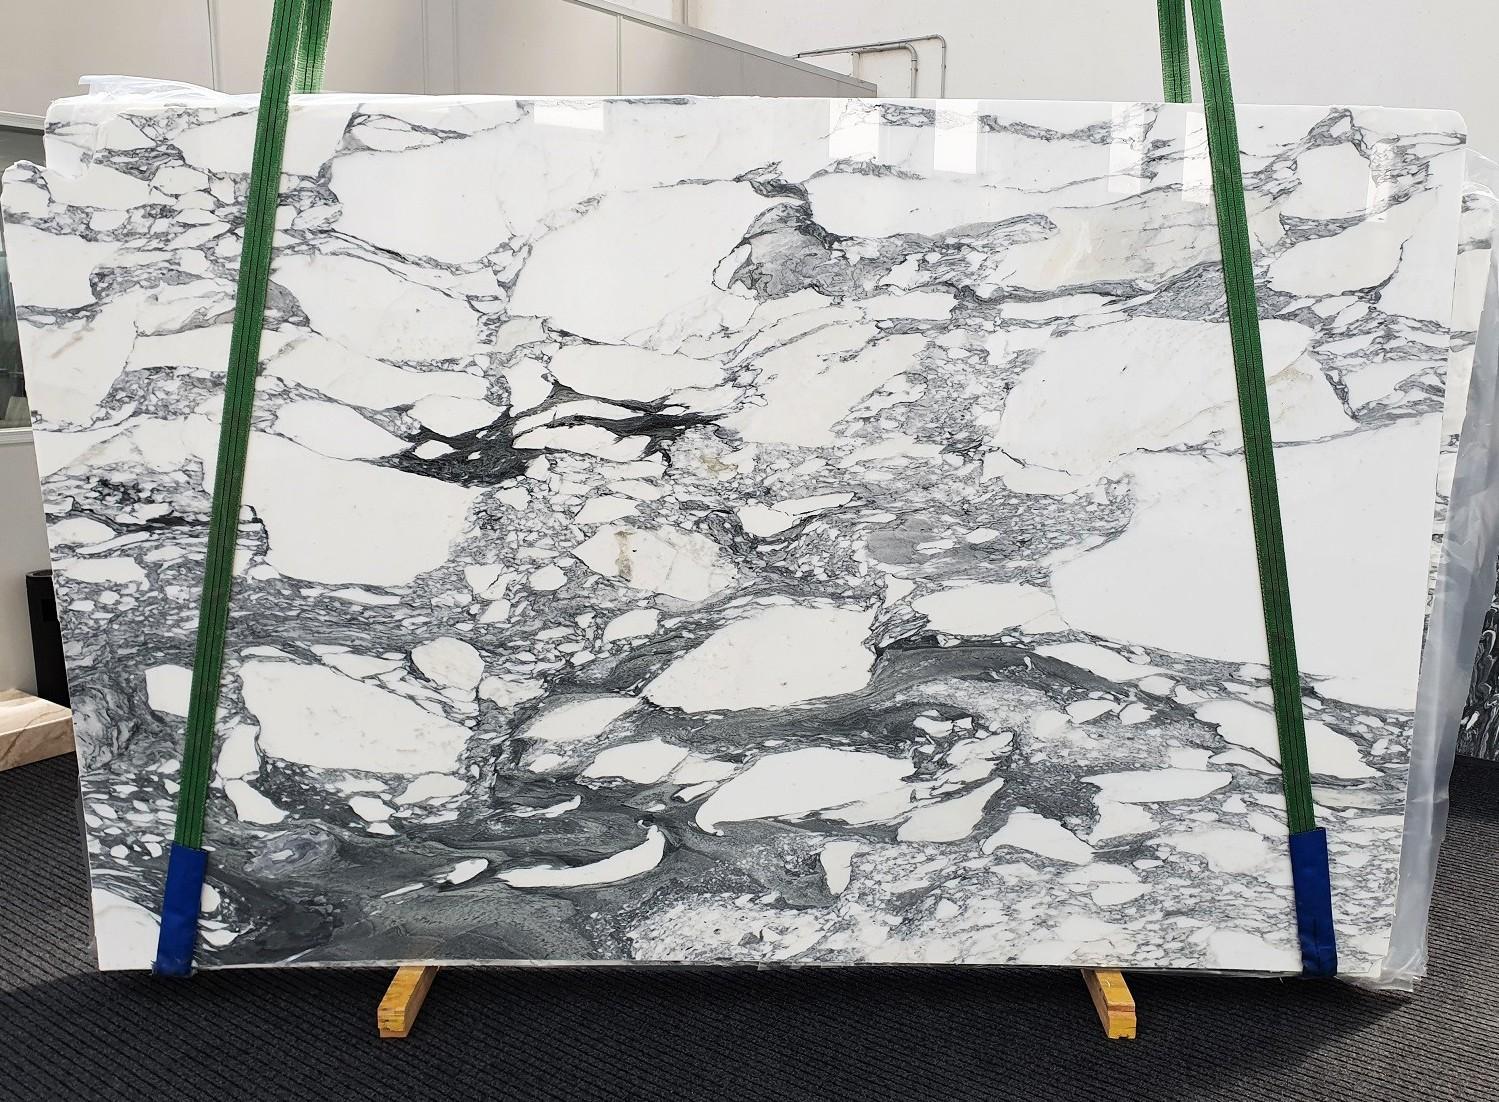 ARABESCATO CORCHIA Supply Veneto (Italy) polished slabs 1433 , Slab #25 natural marble